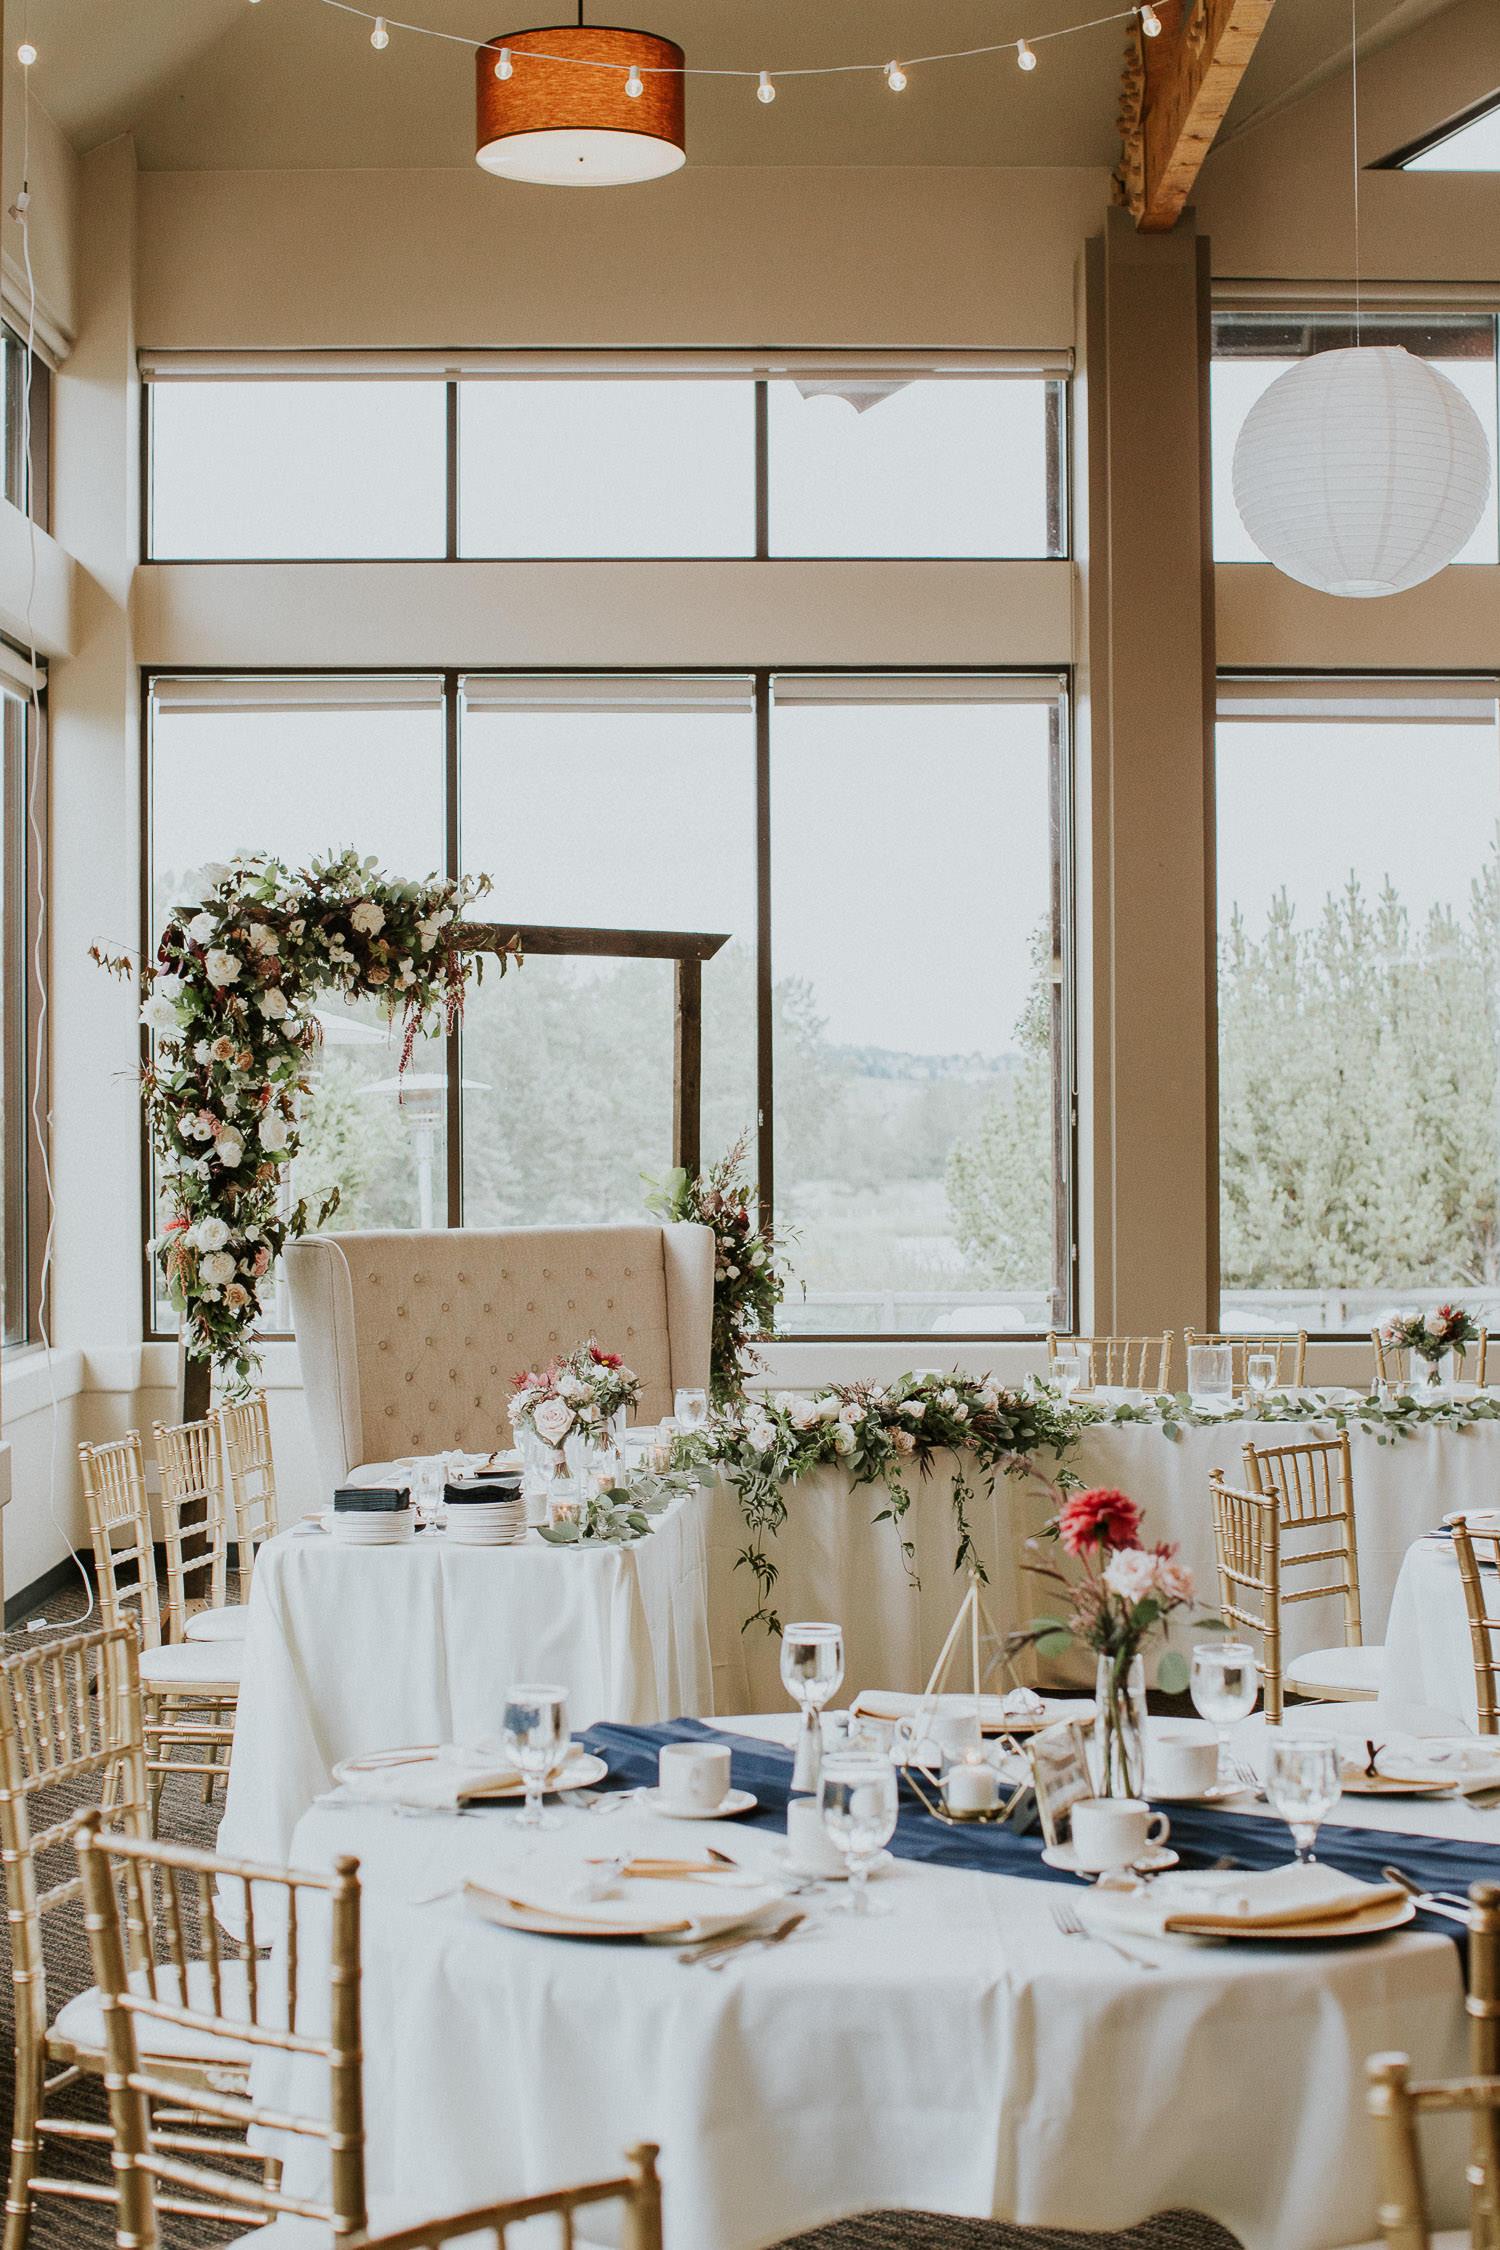 valley-ridge-golf-club-wedding-sarah-pukin-0183